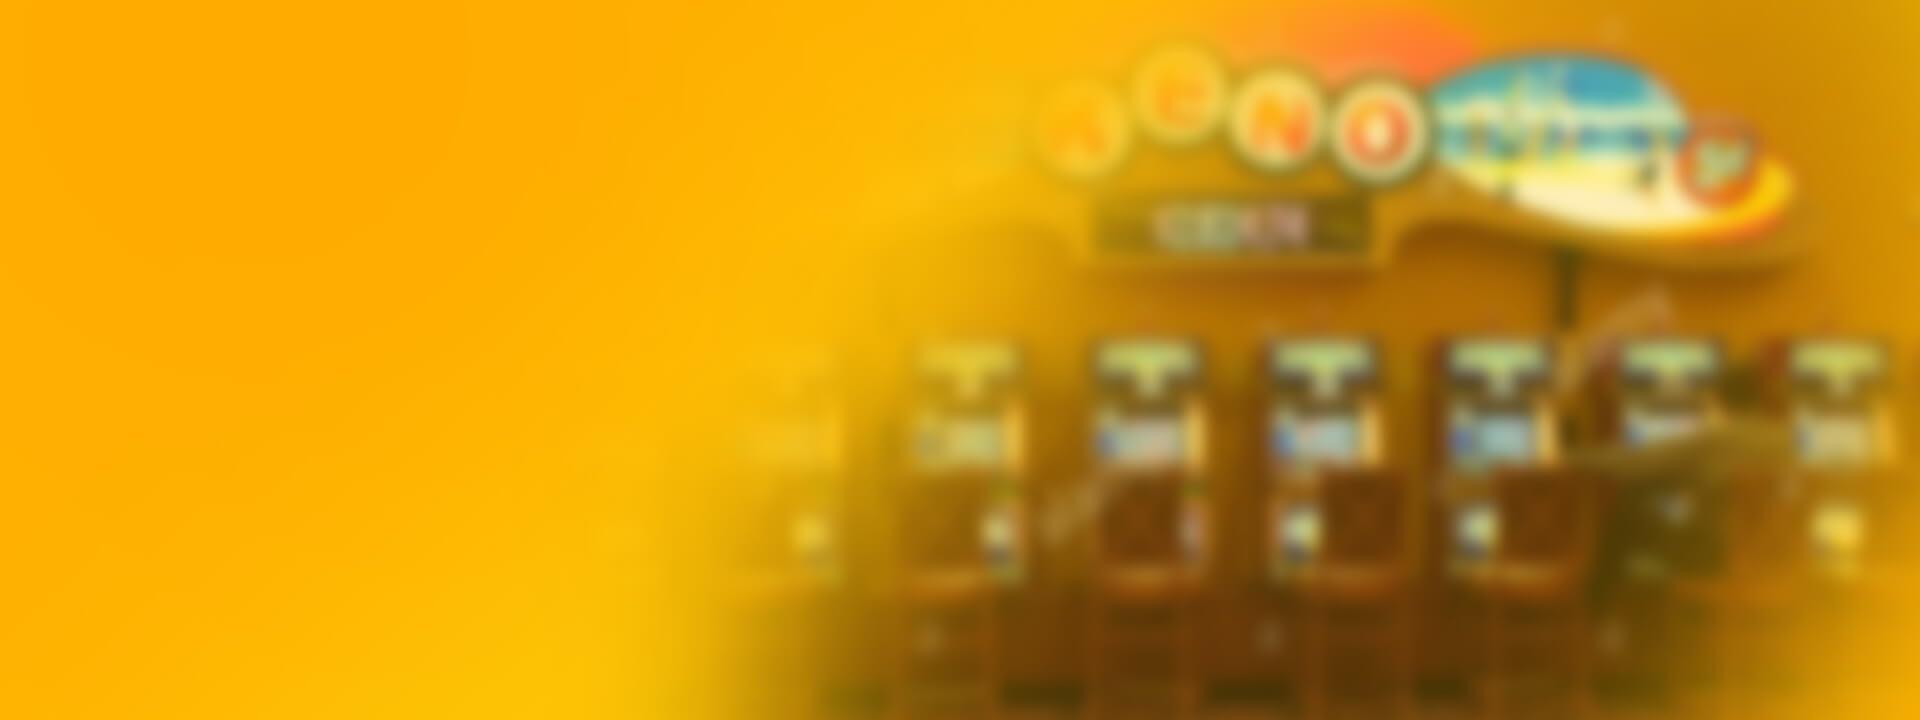 lottery bg 1 - LOTTERIES